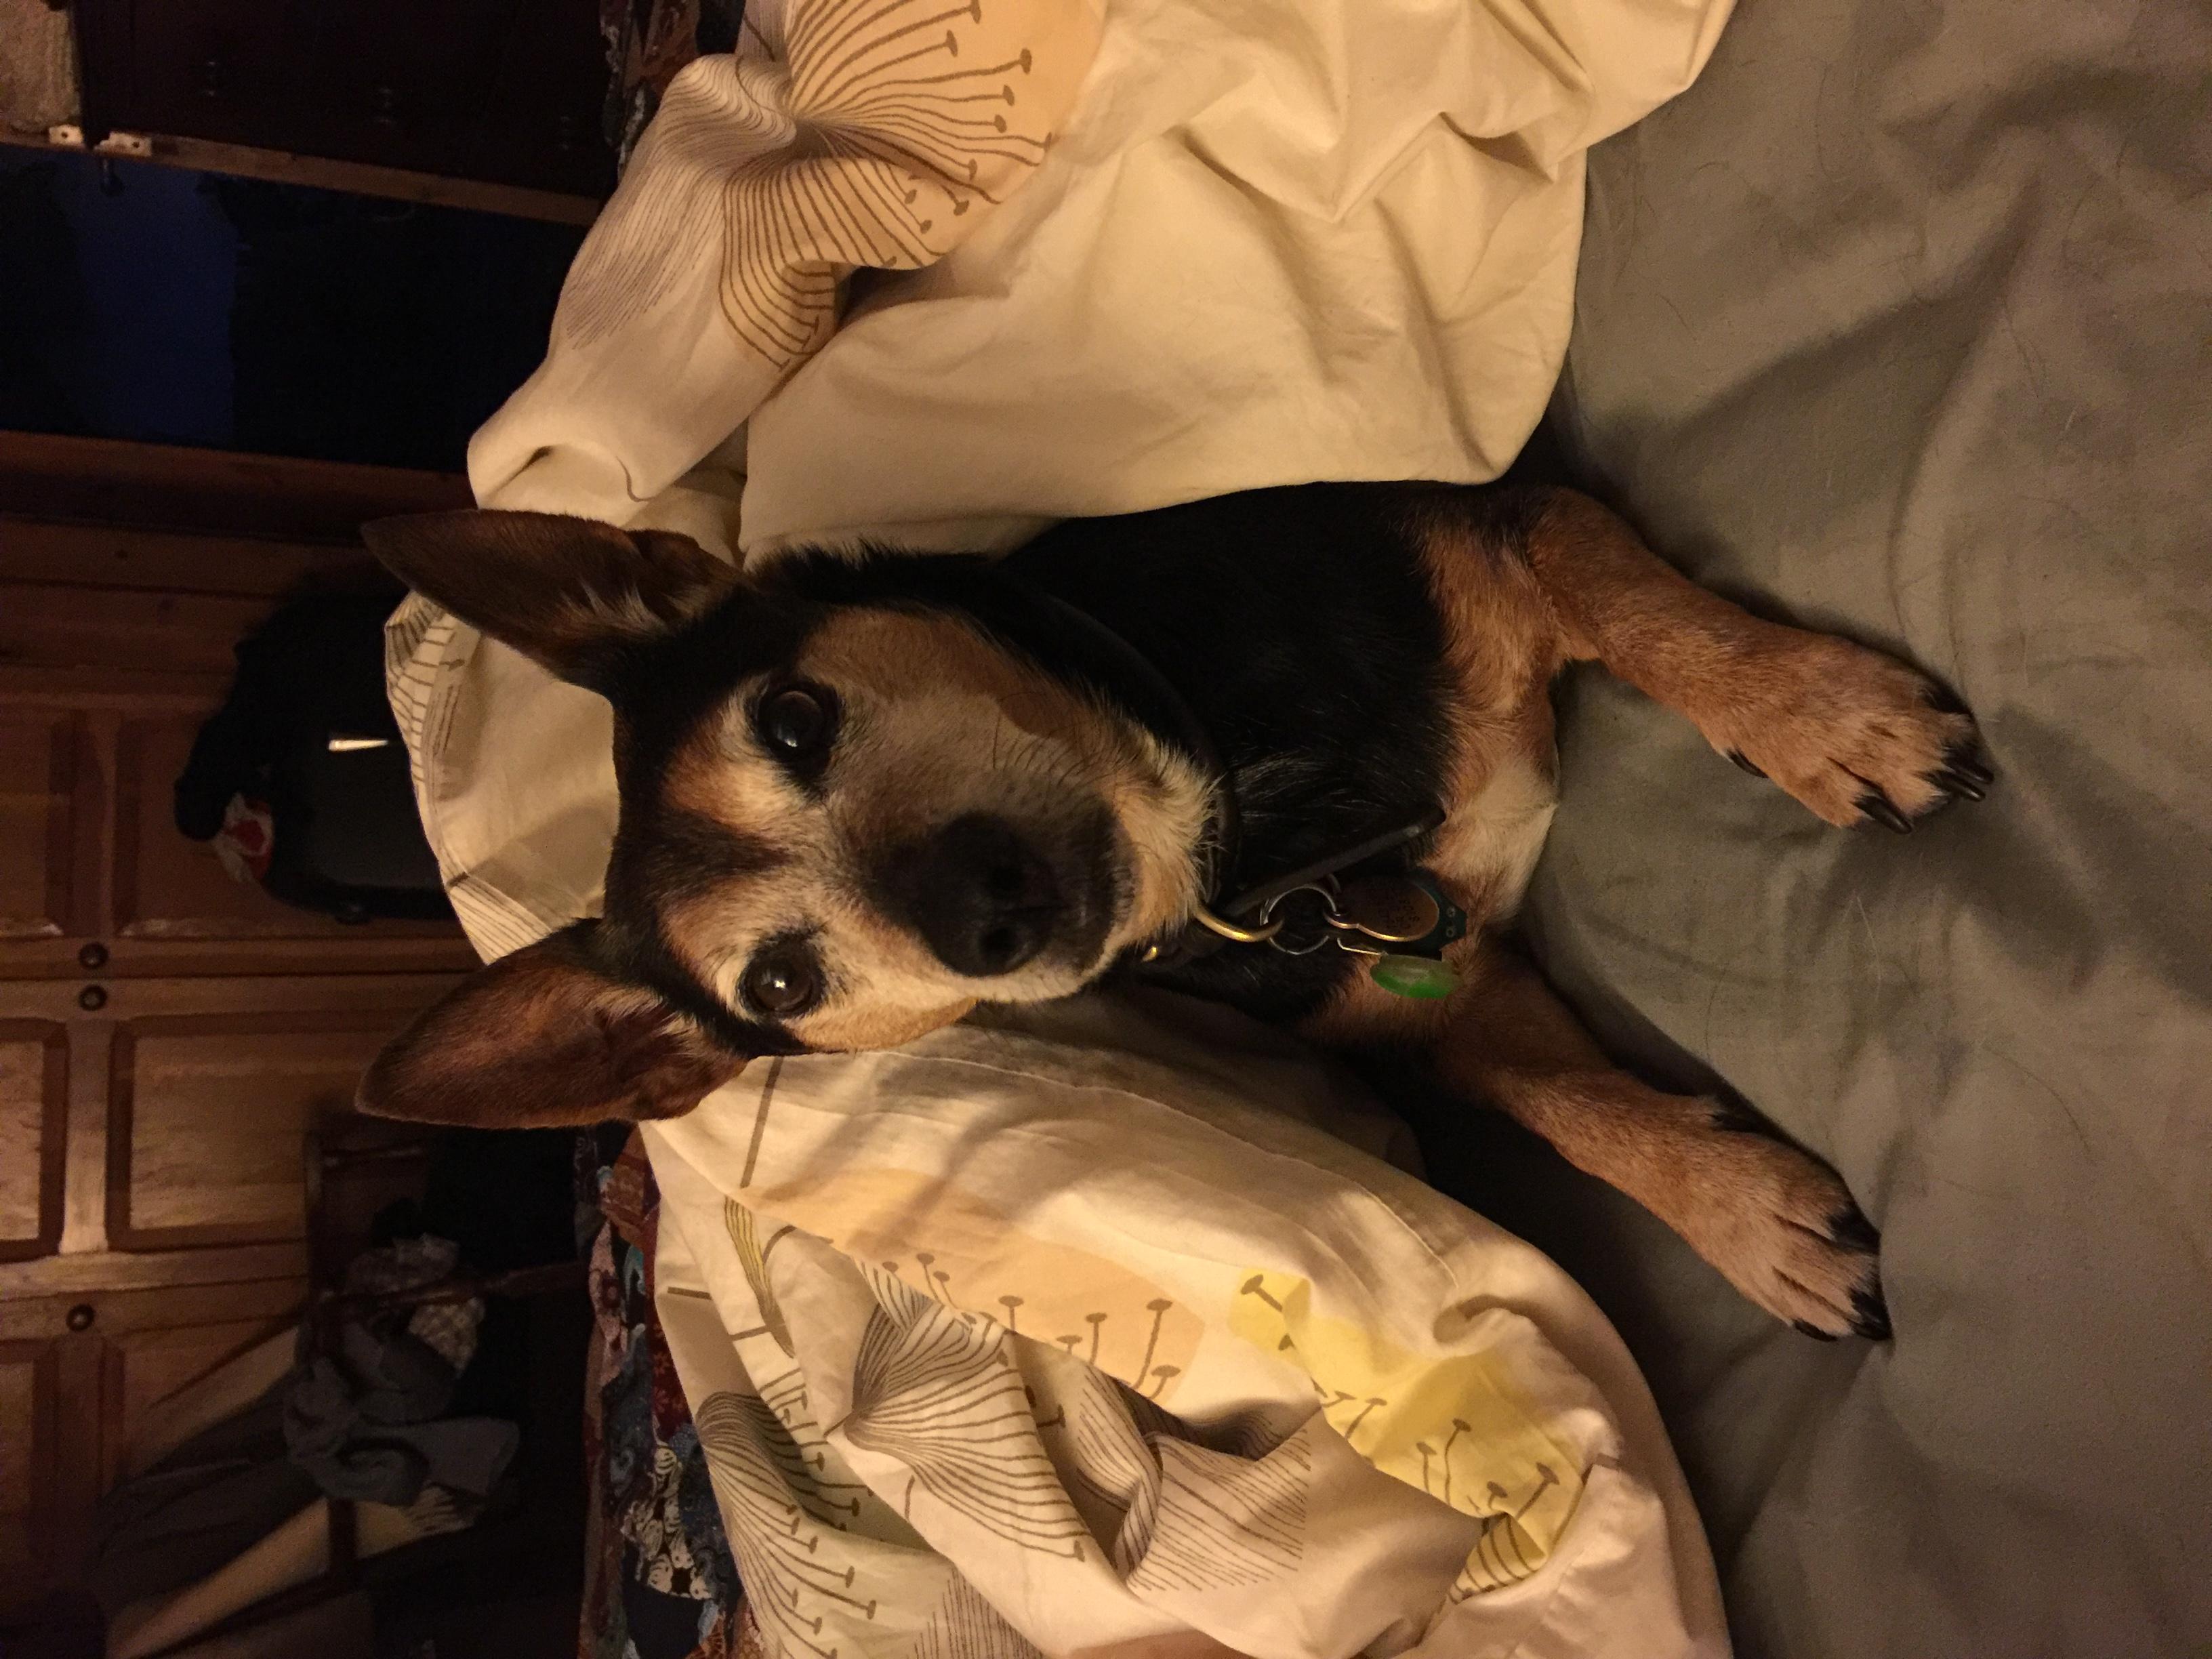 jack russell terrier under duvet